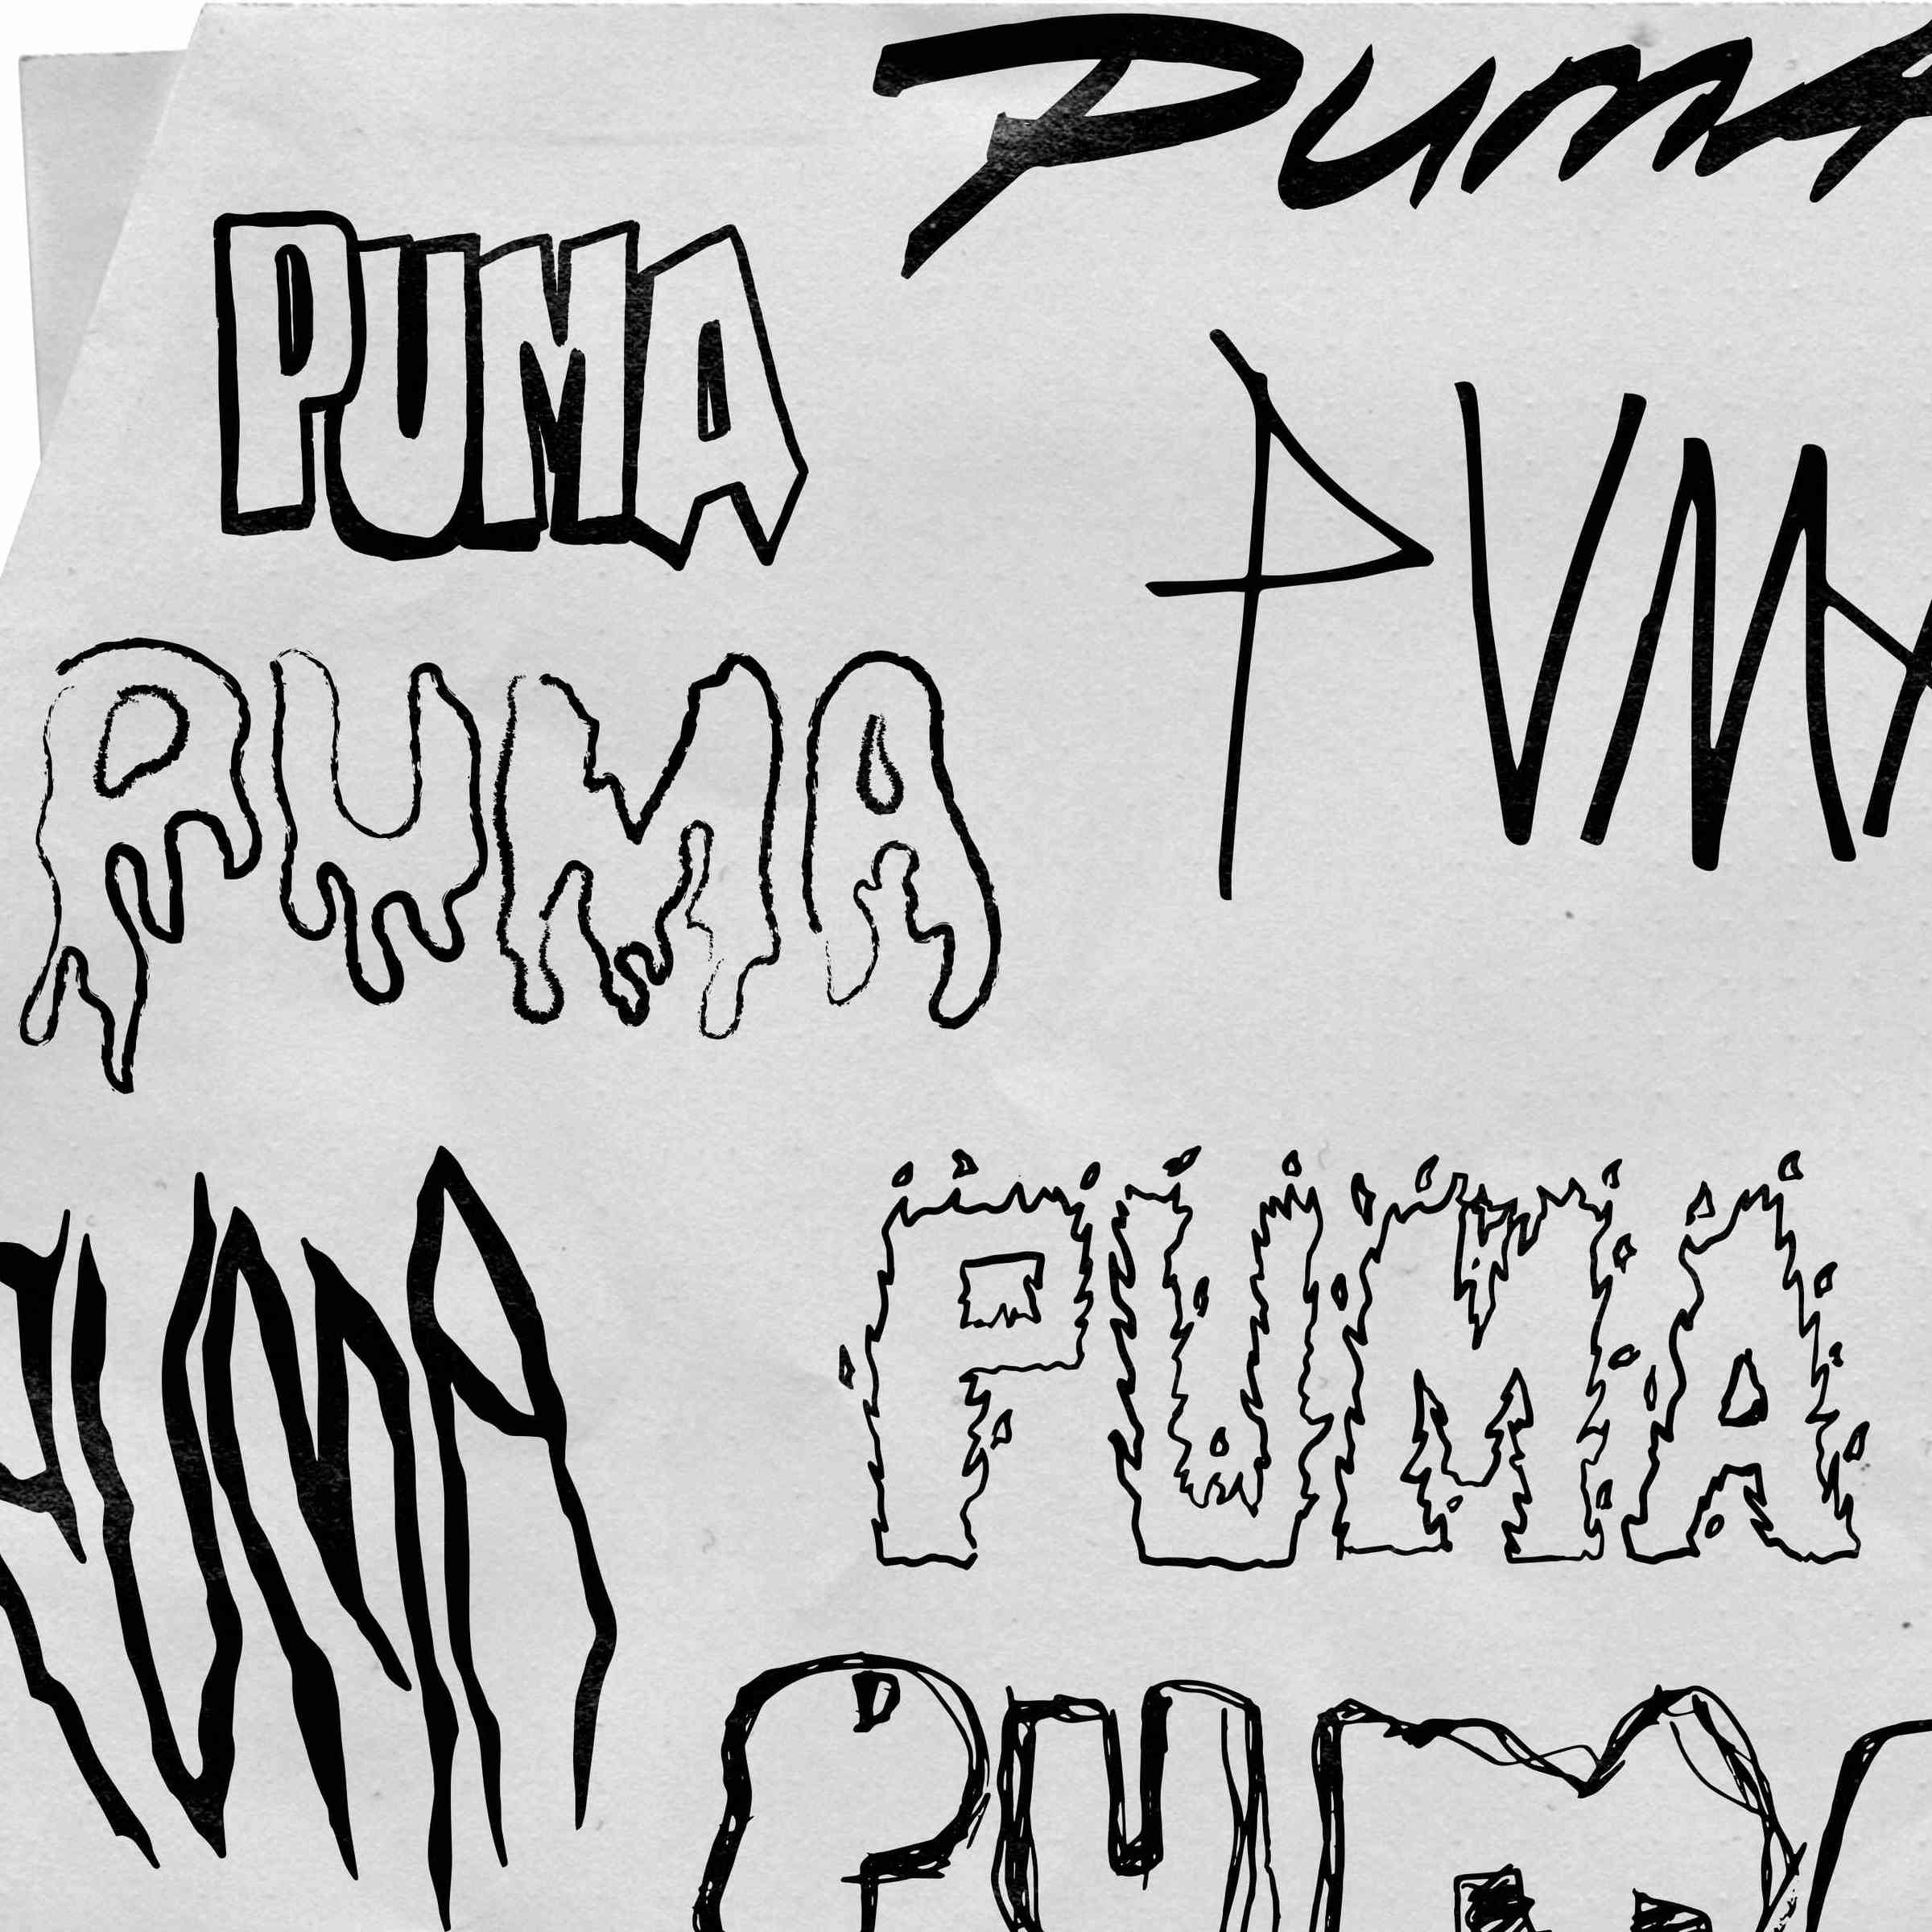 PUMA logo hand drawn illustrations.